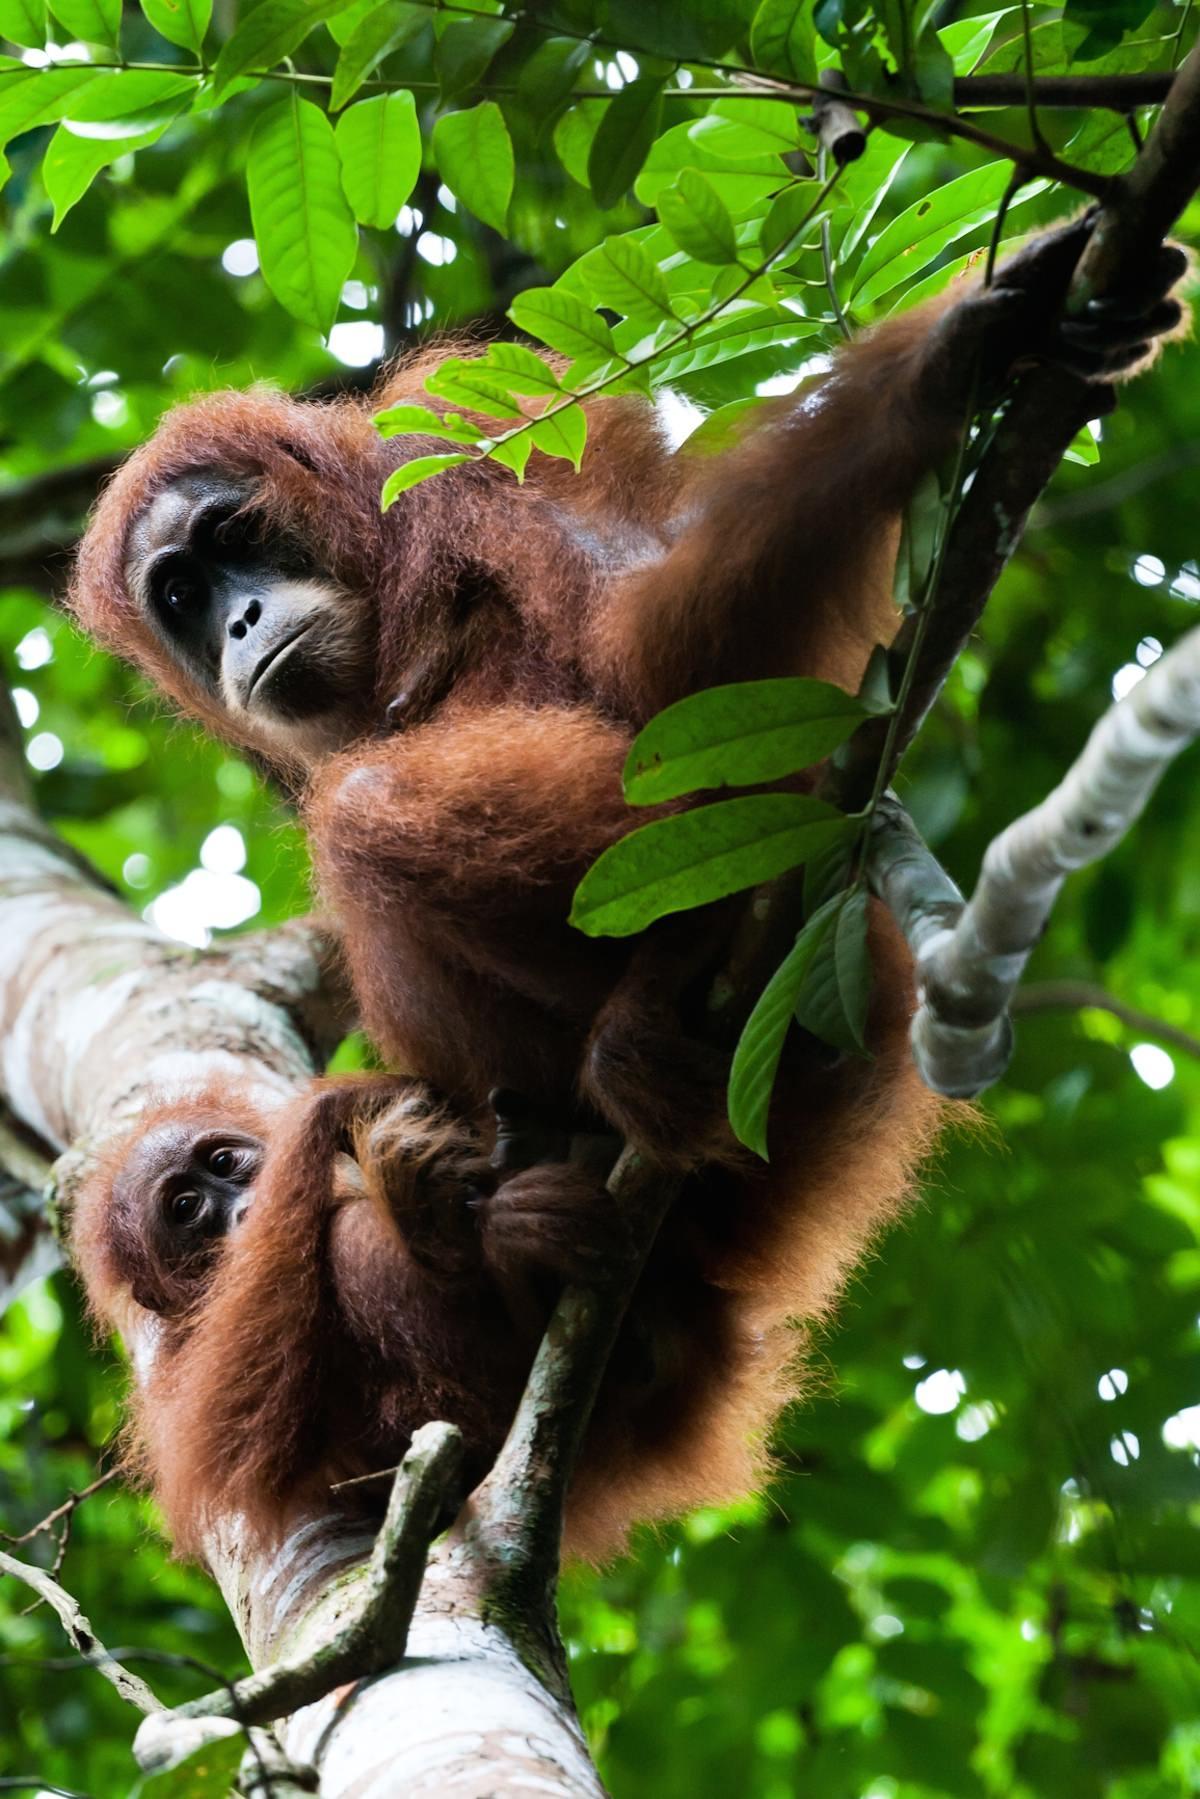 Female Sumtaran orangutan with her infant